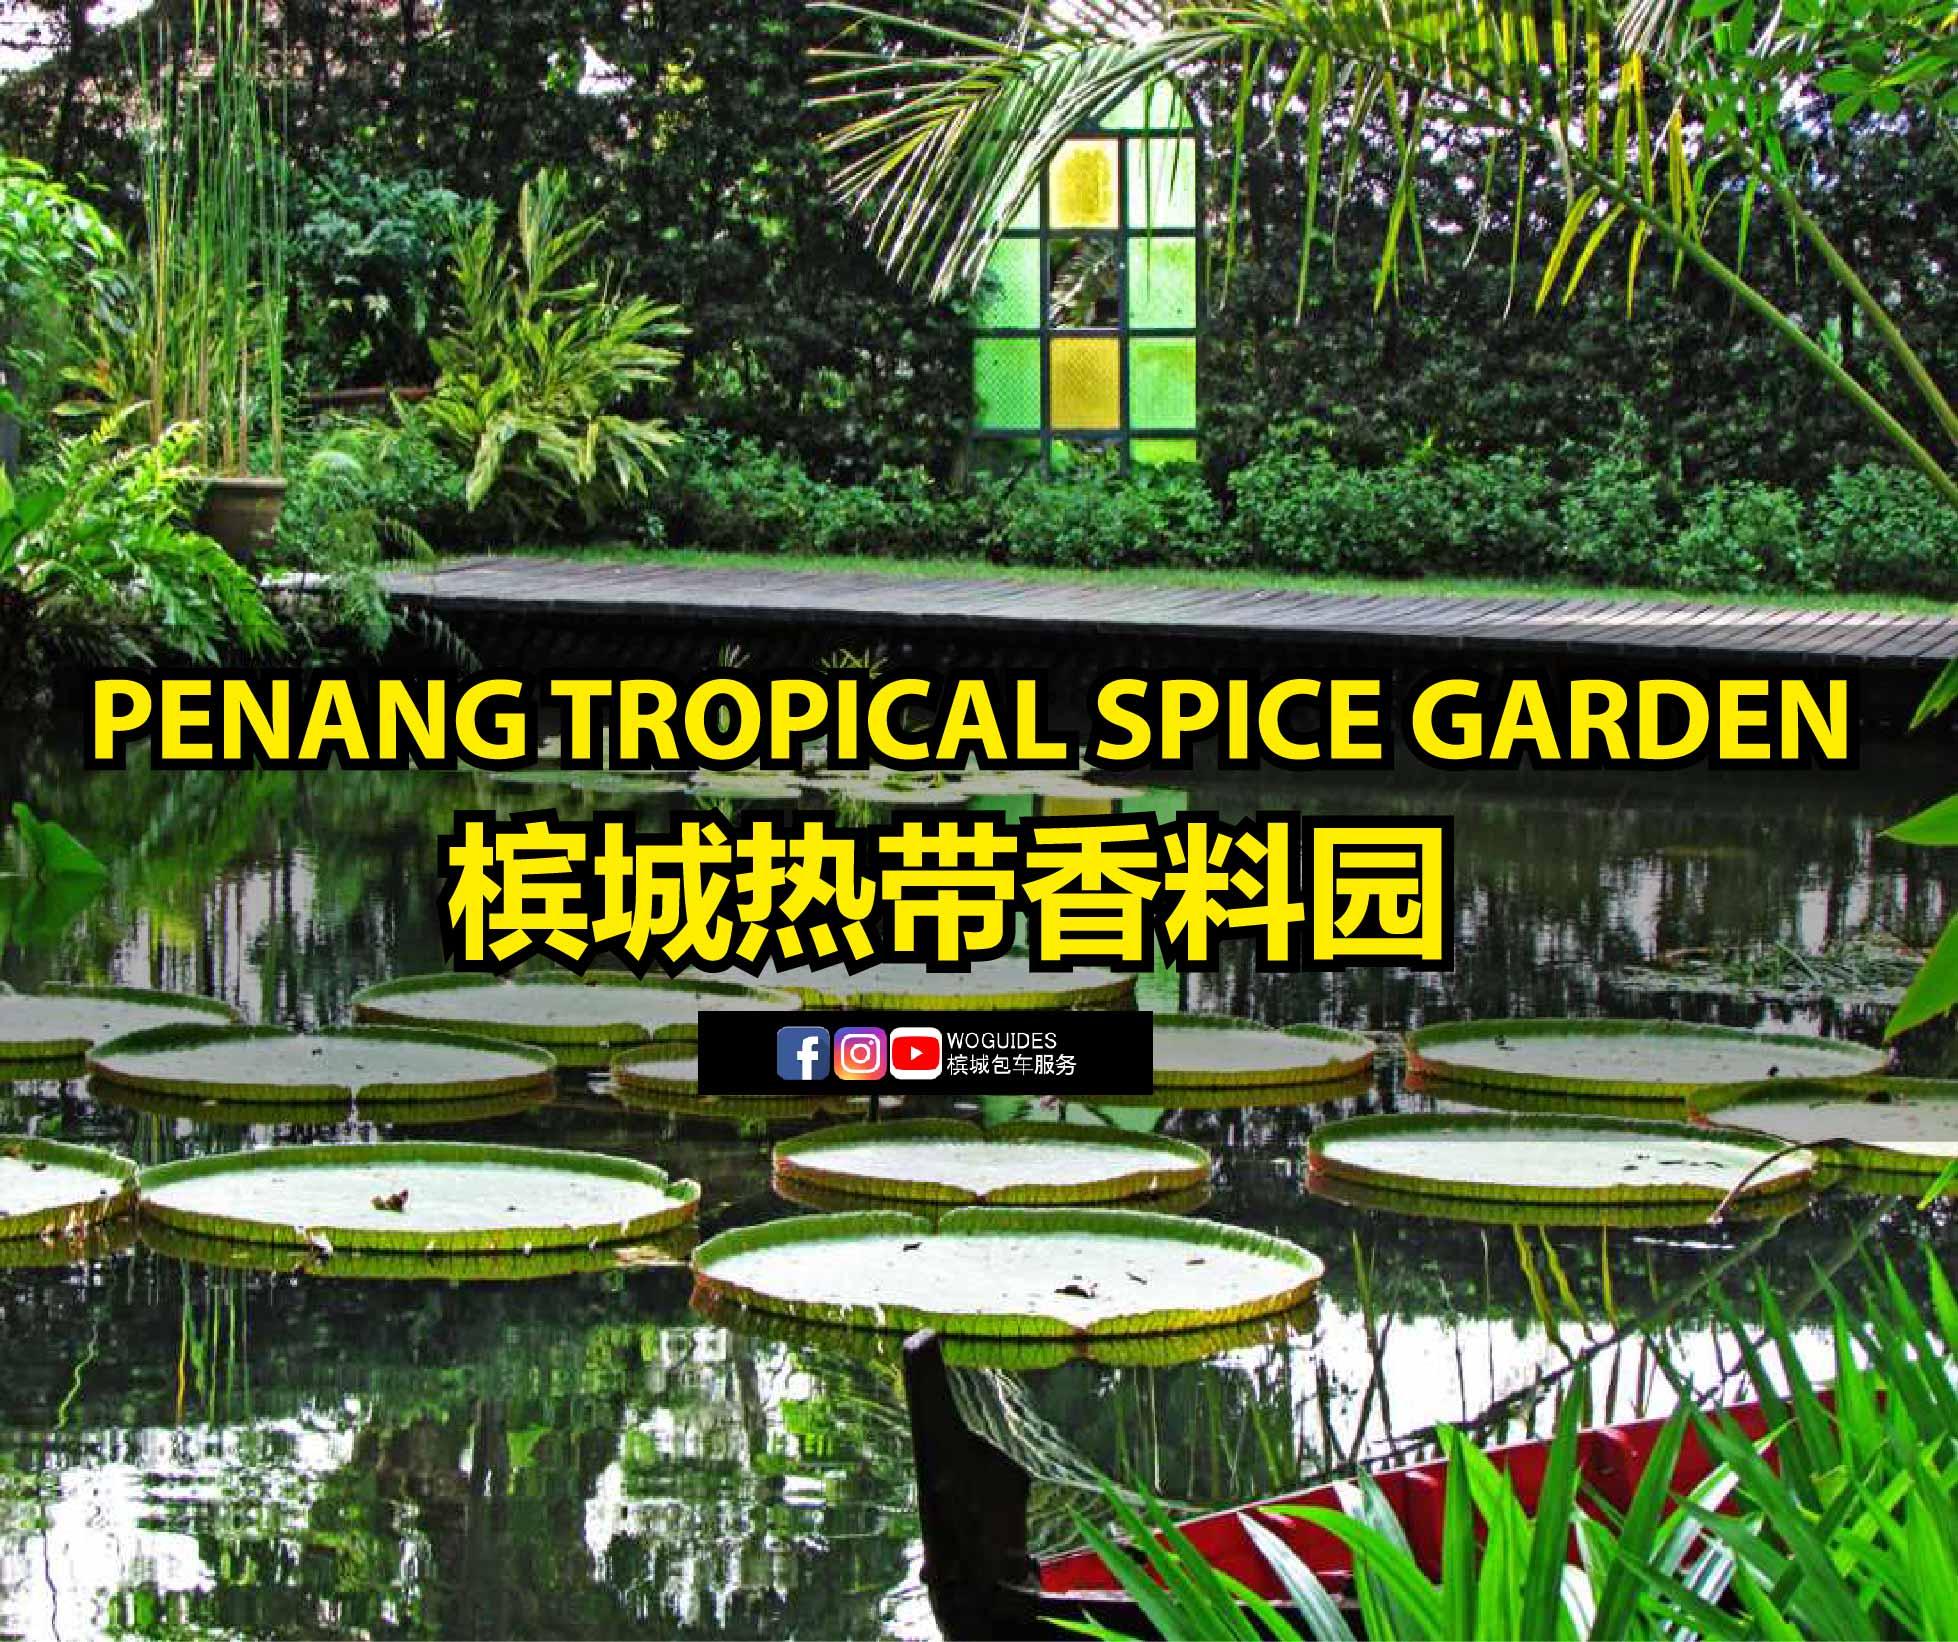 penang van rental - penang tropical spice garden (cover)